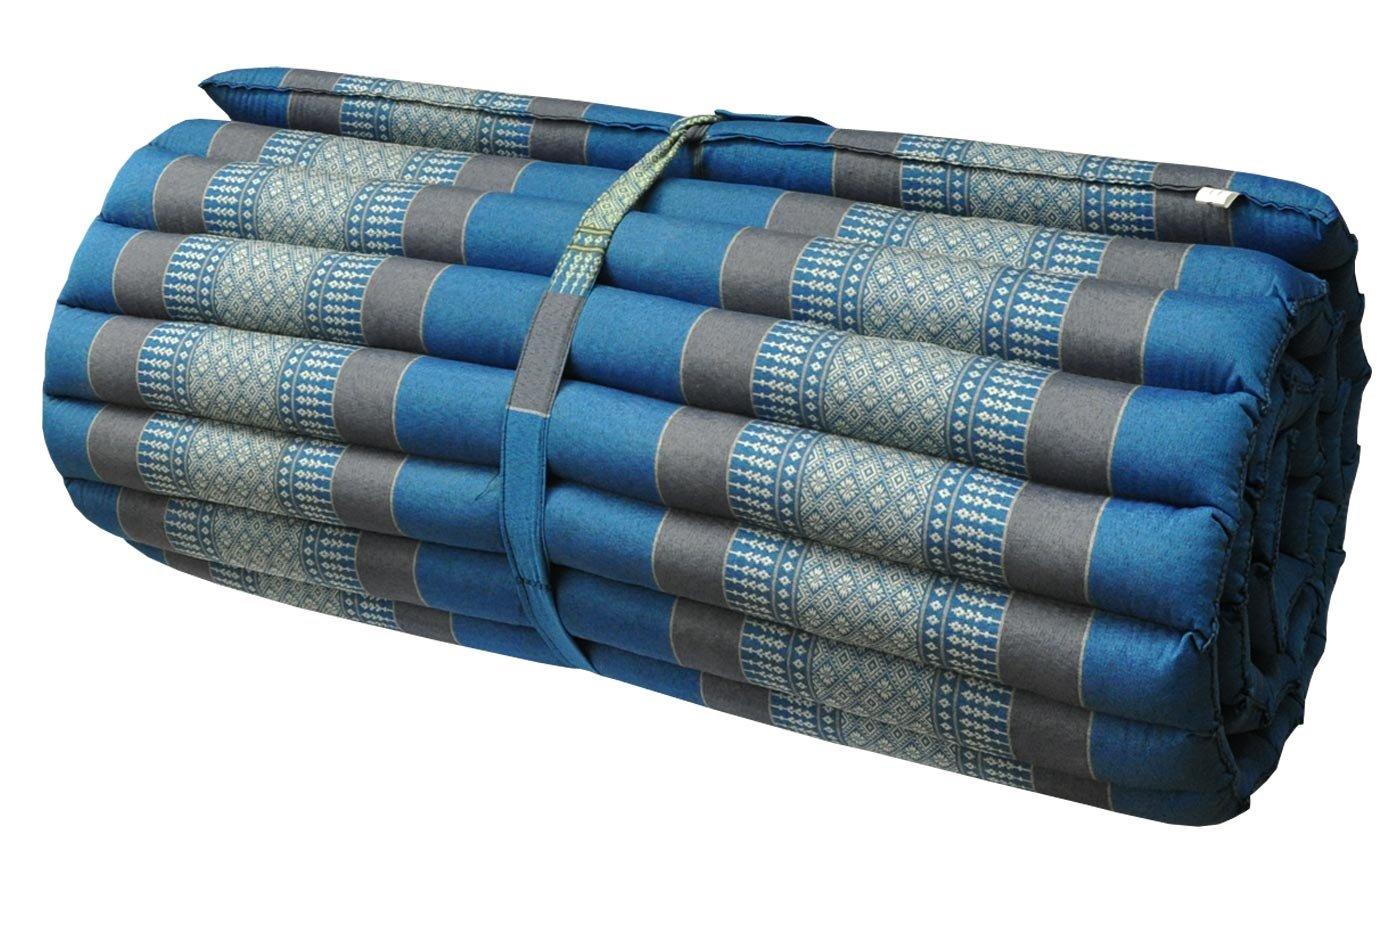 Thai mattress big size (75/180), blue/grey, relaxation, beach cushion, pool, meditation, yoga (82614) by Wilai GmbH